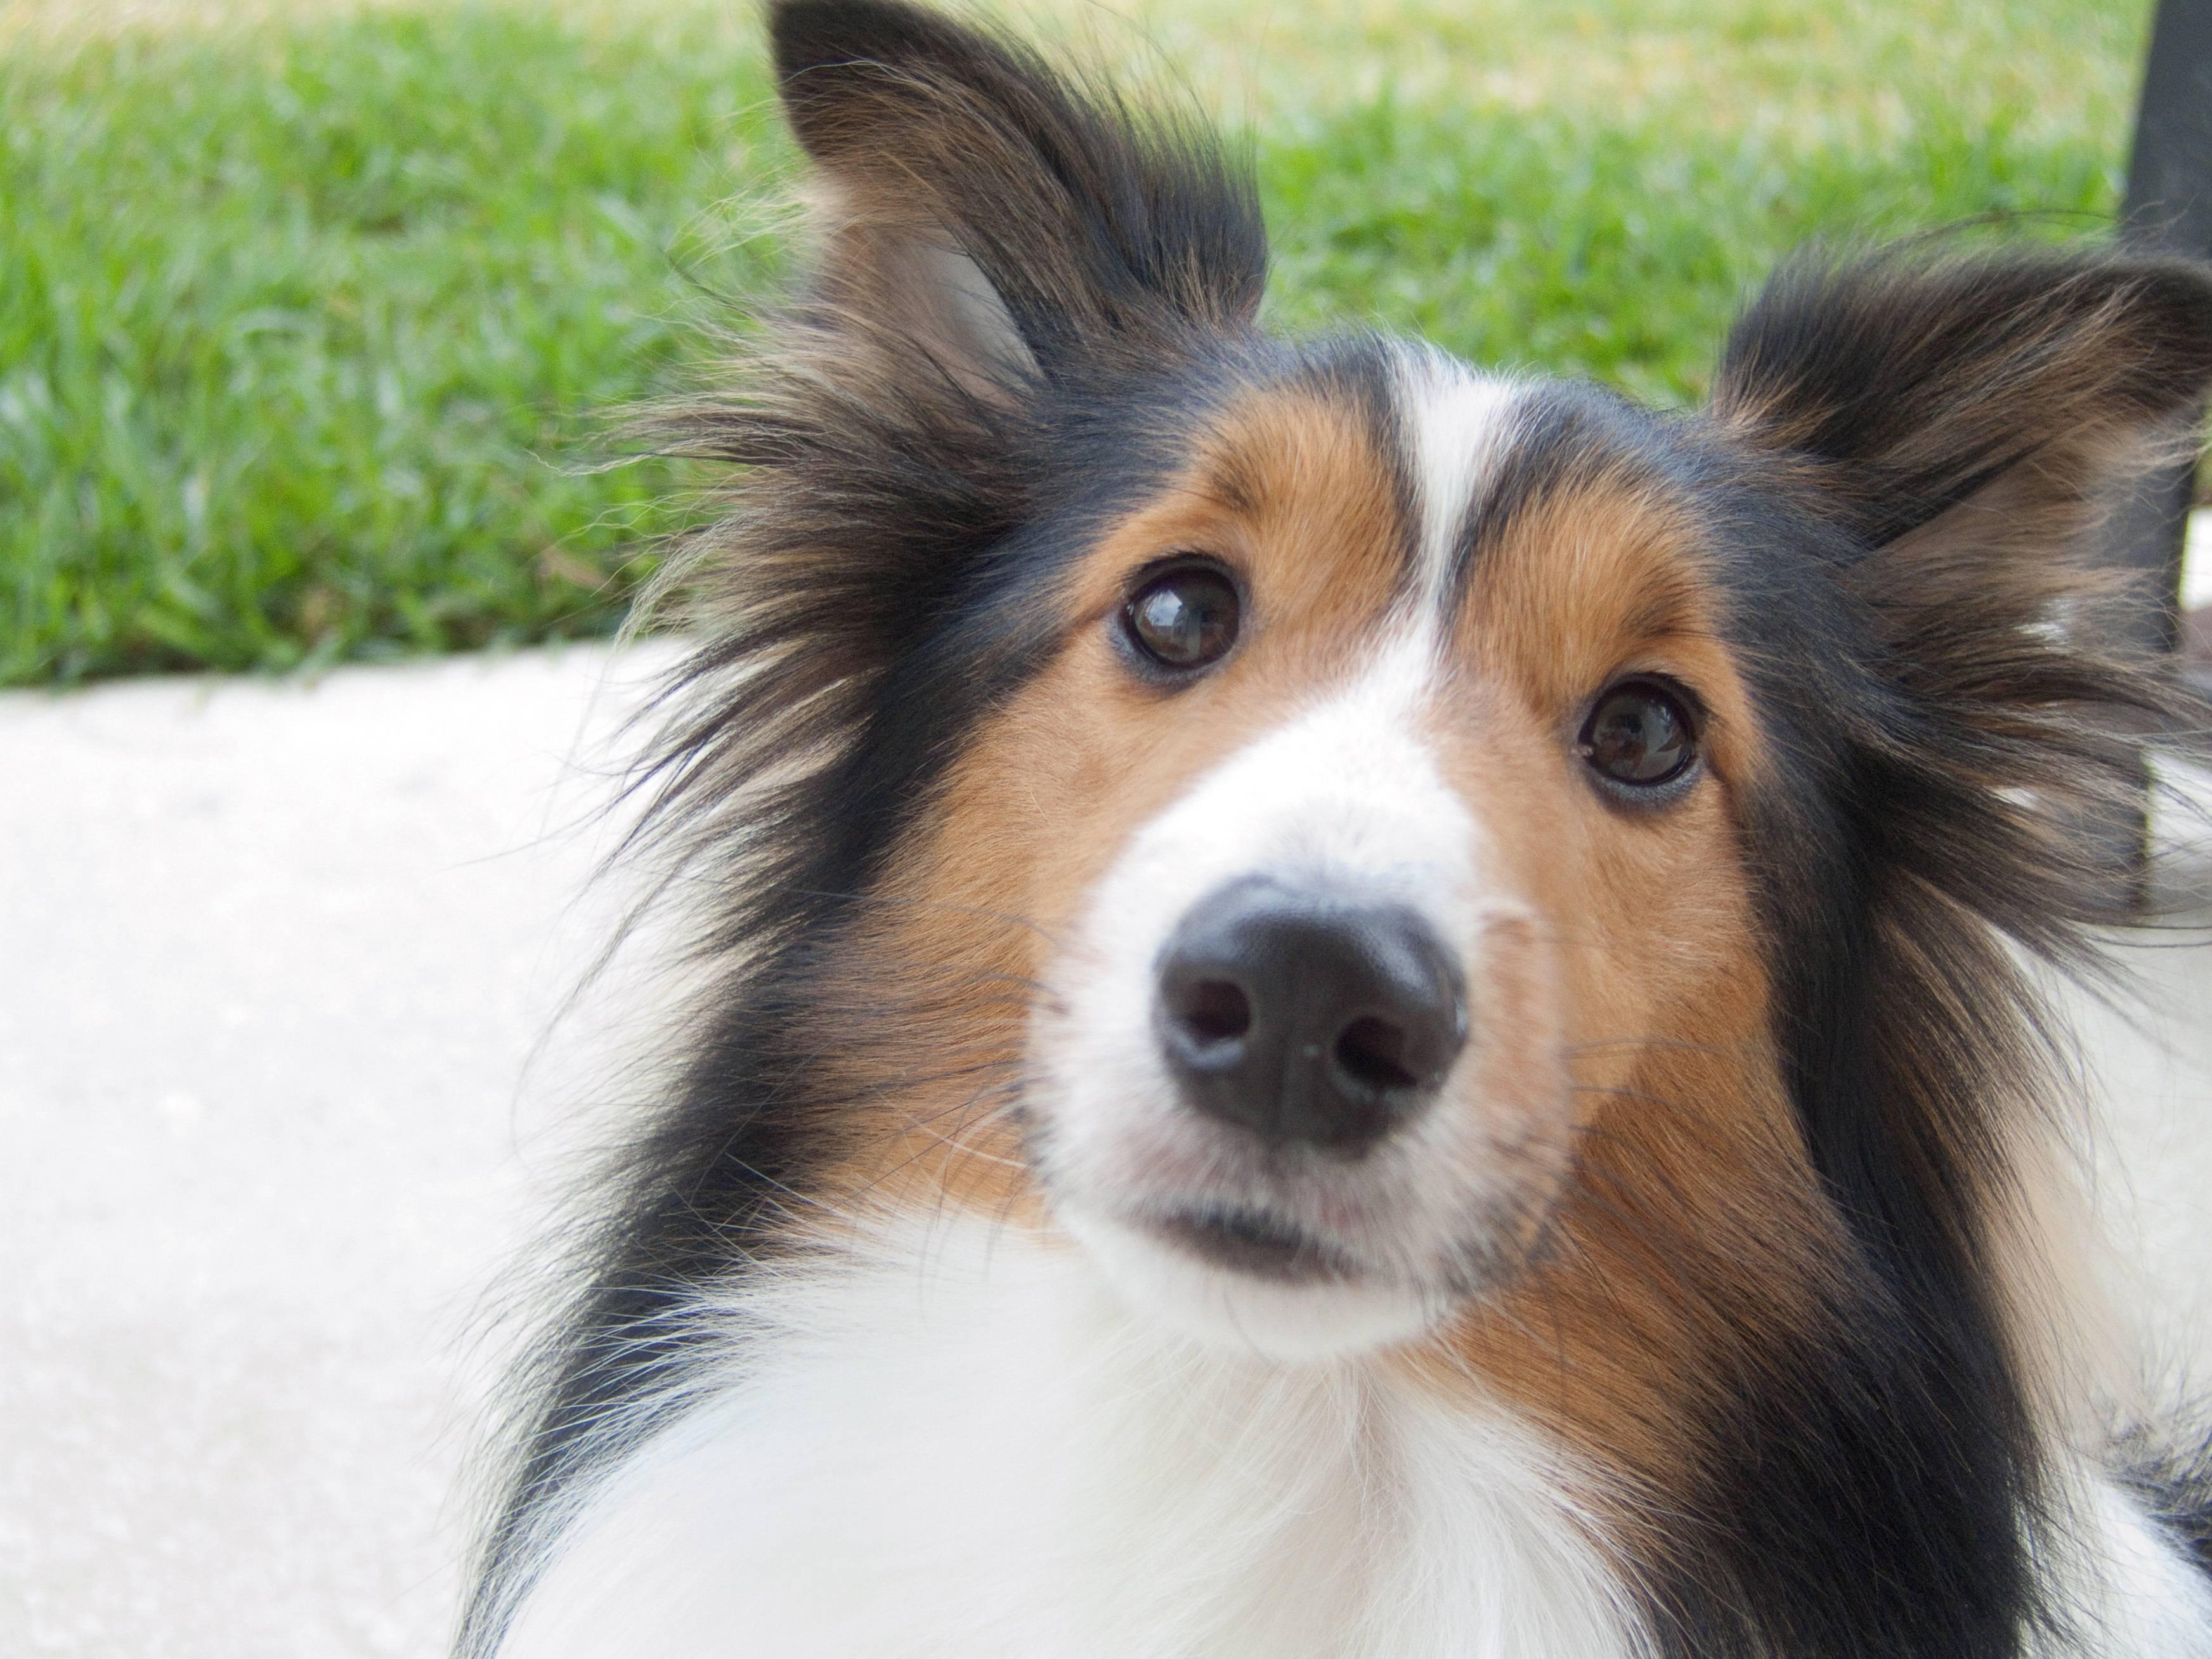 Dog Breeds Like Shelties